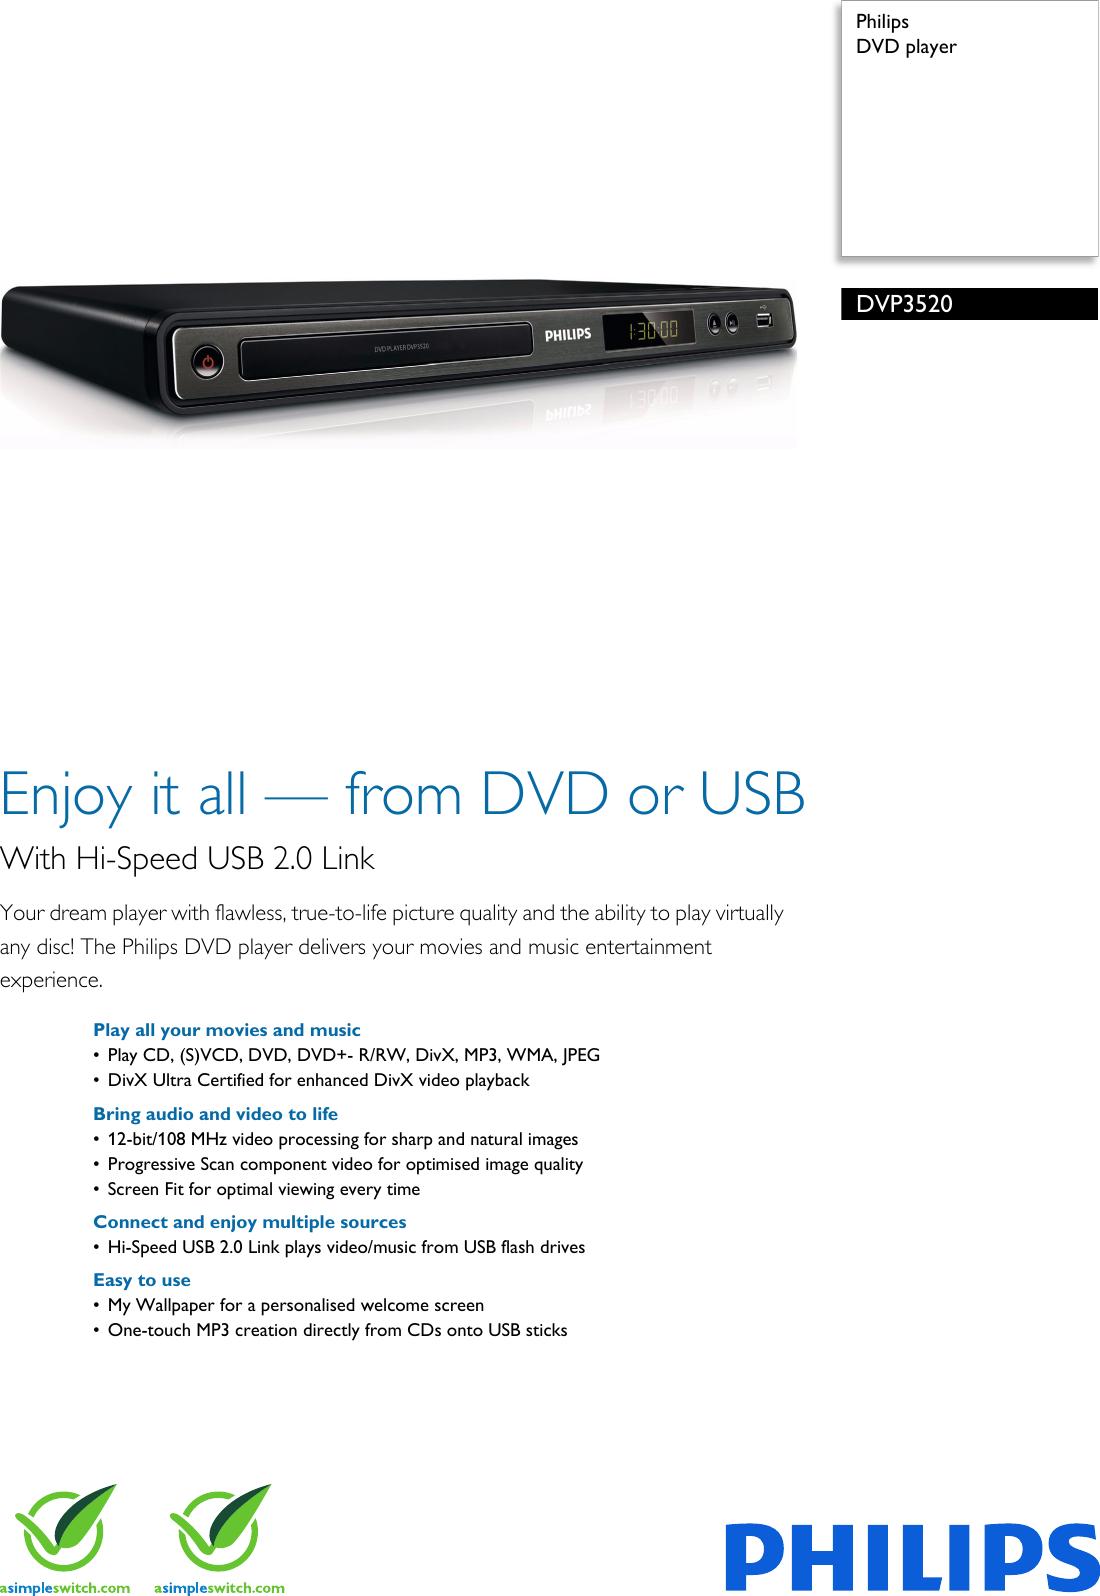 philips dvp3520 05 dvd player user manual leaflet dvp3520 05 pss enggb rh usermanual wiki Funai DVD Player Philips Portable DVD Player